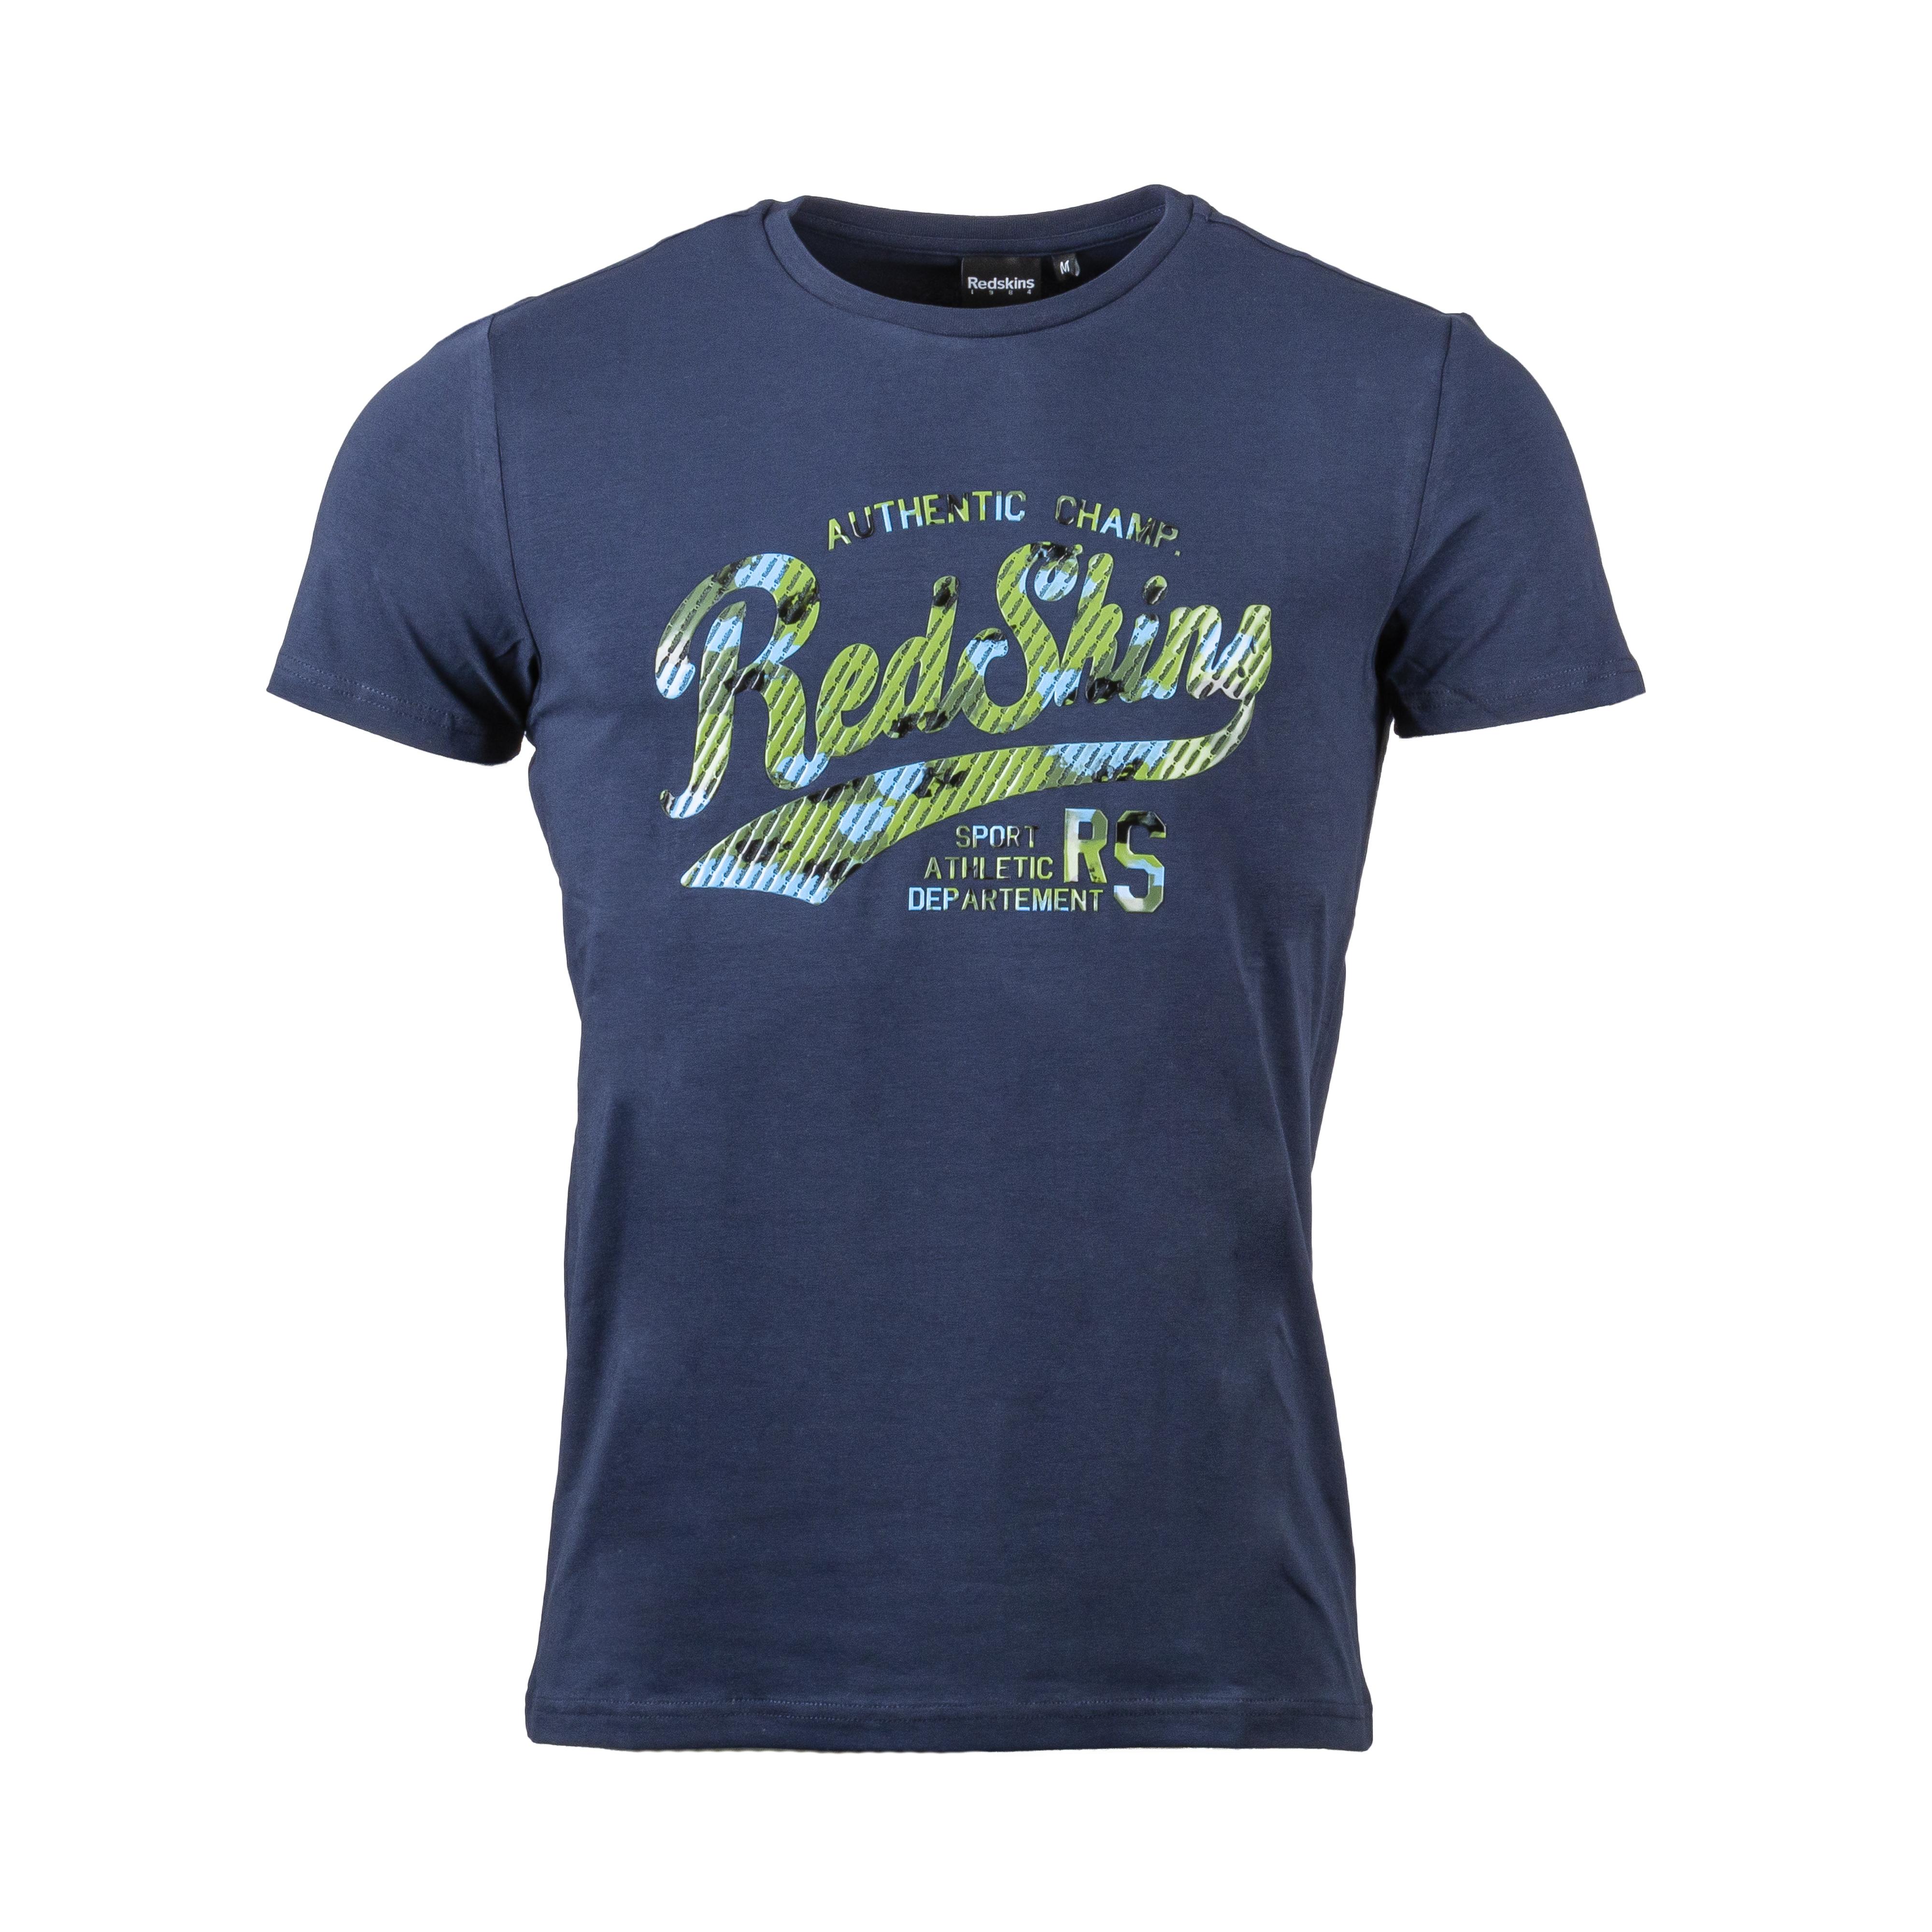 Tee-shirt col rond  holster en coton stretch bleu marine floqué